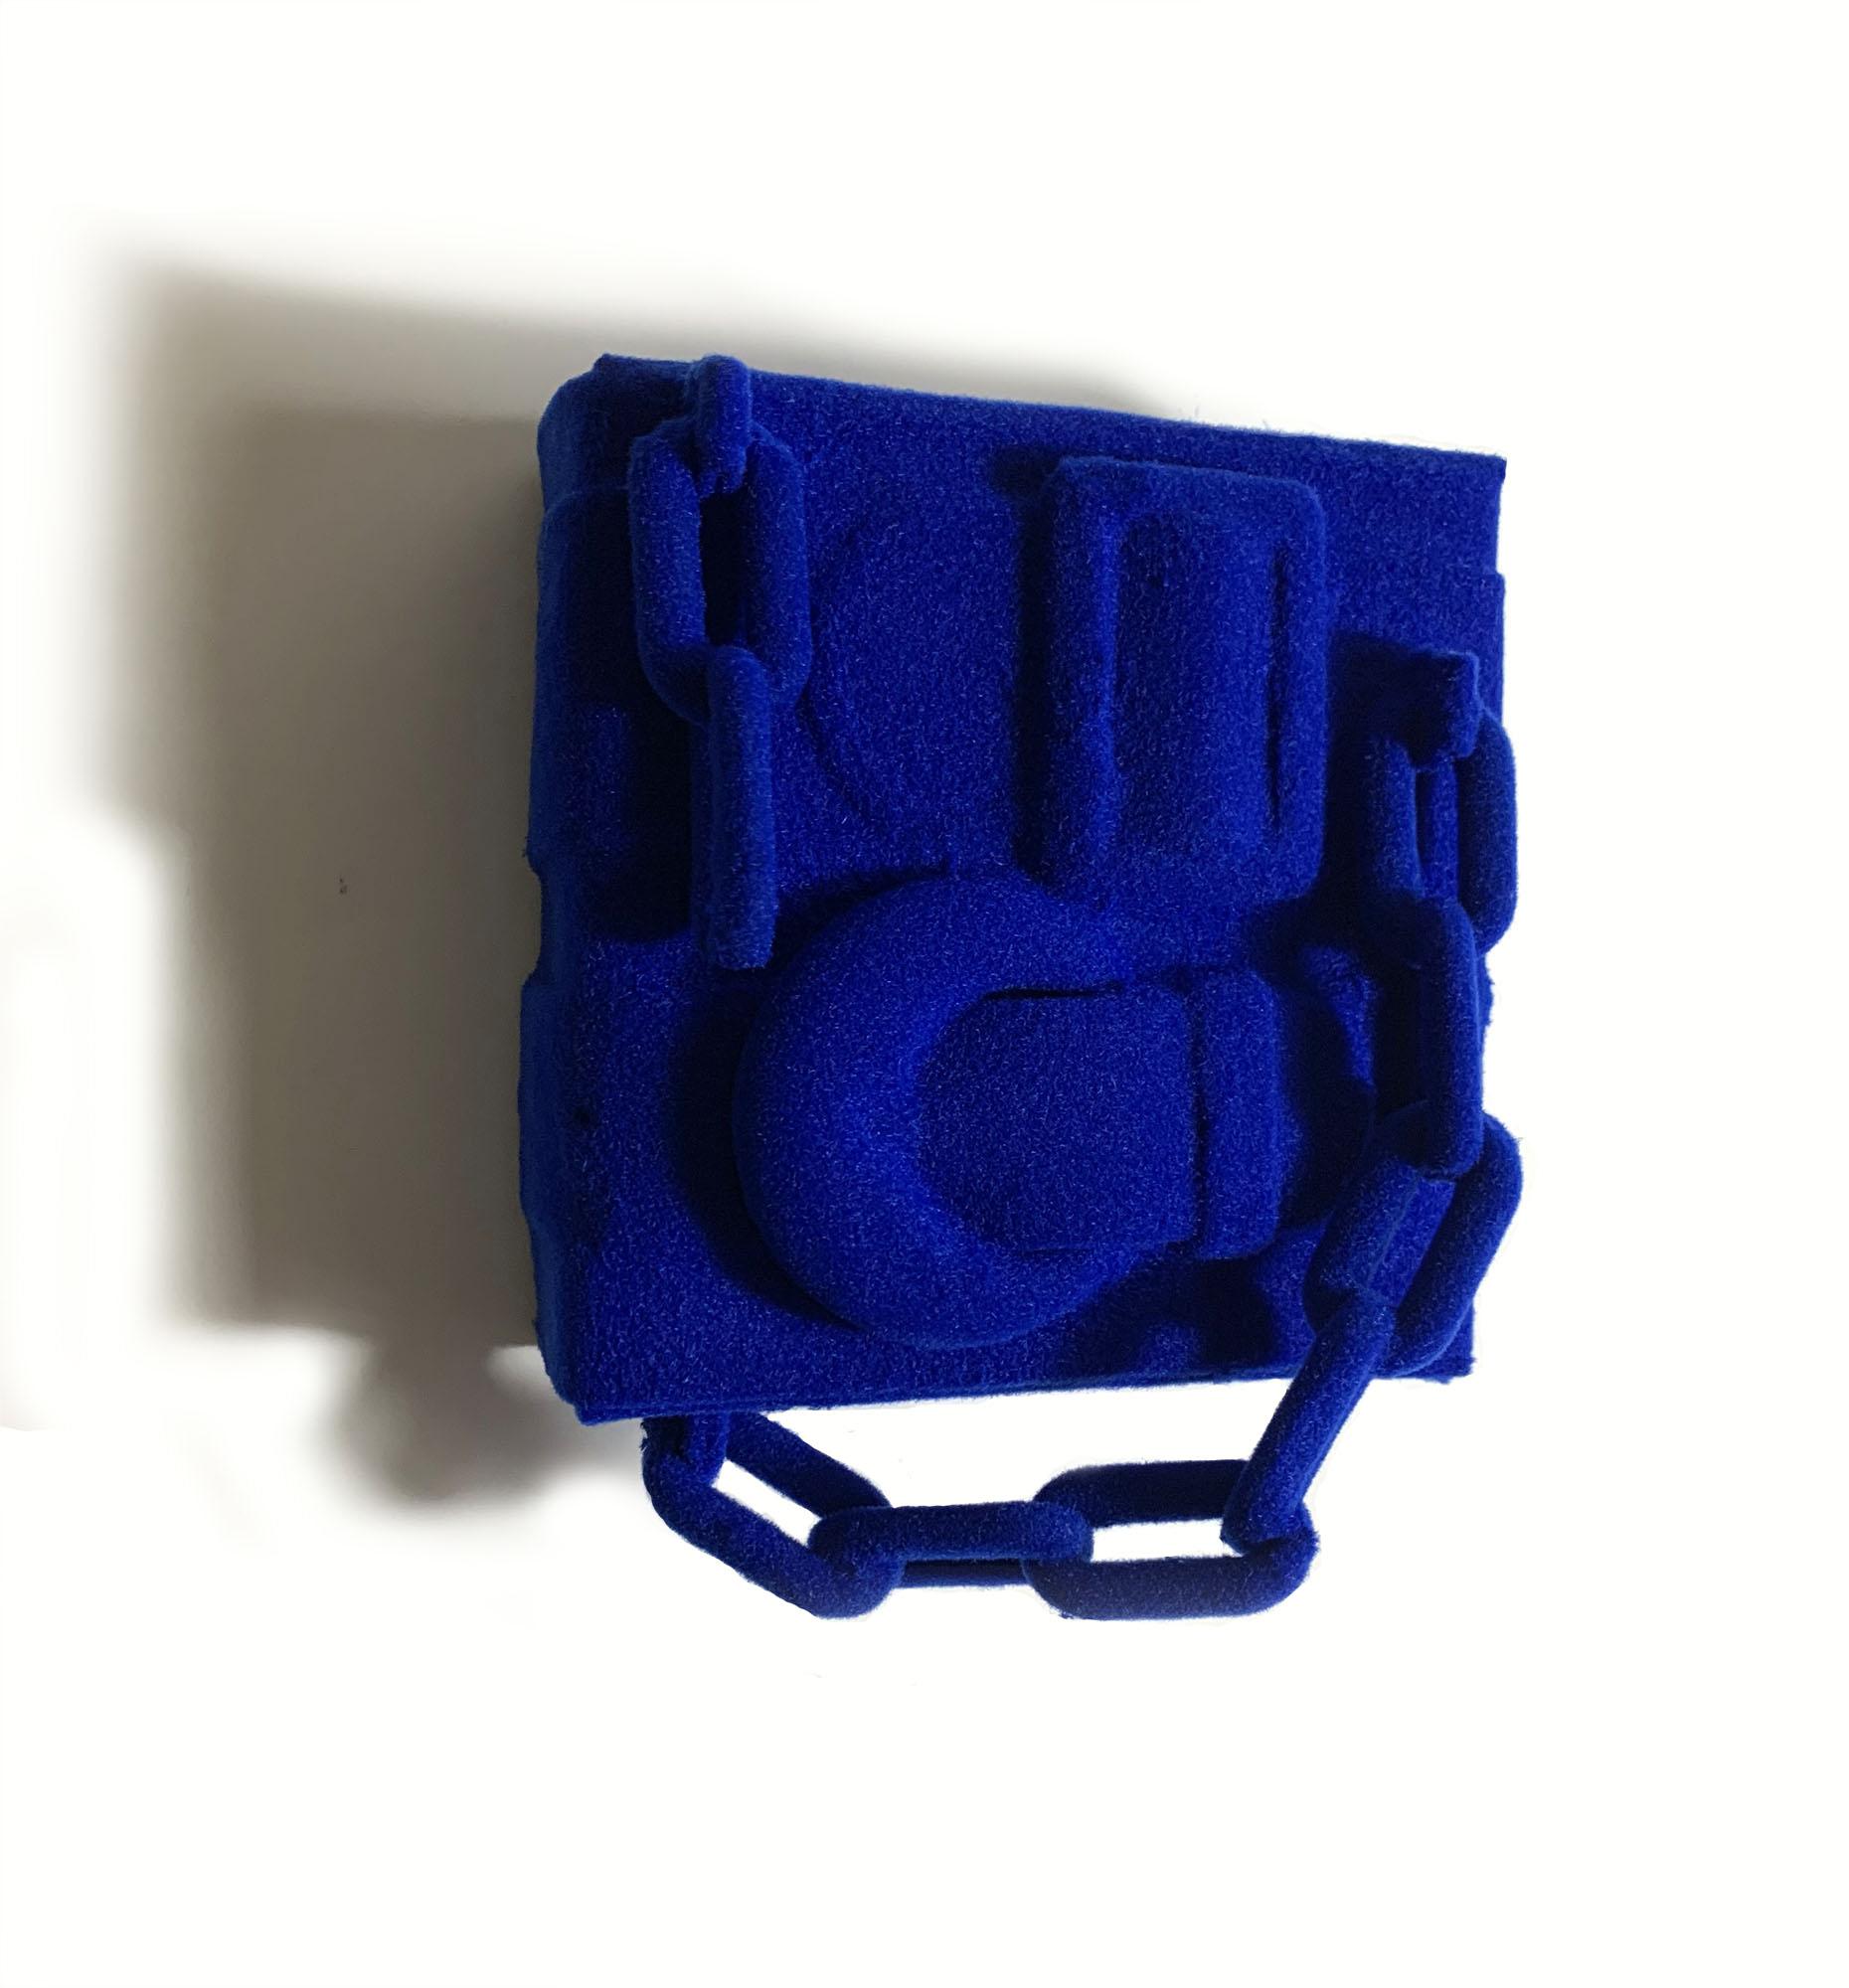 noah kashiani, artist, artwork, blue bag